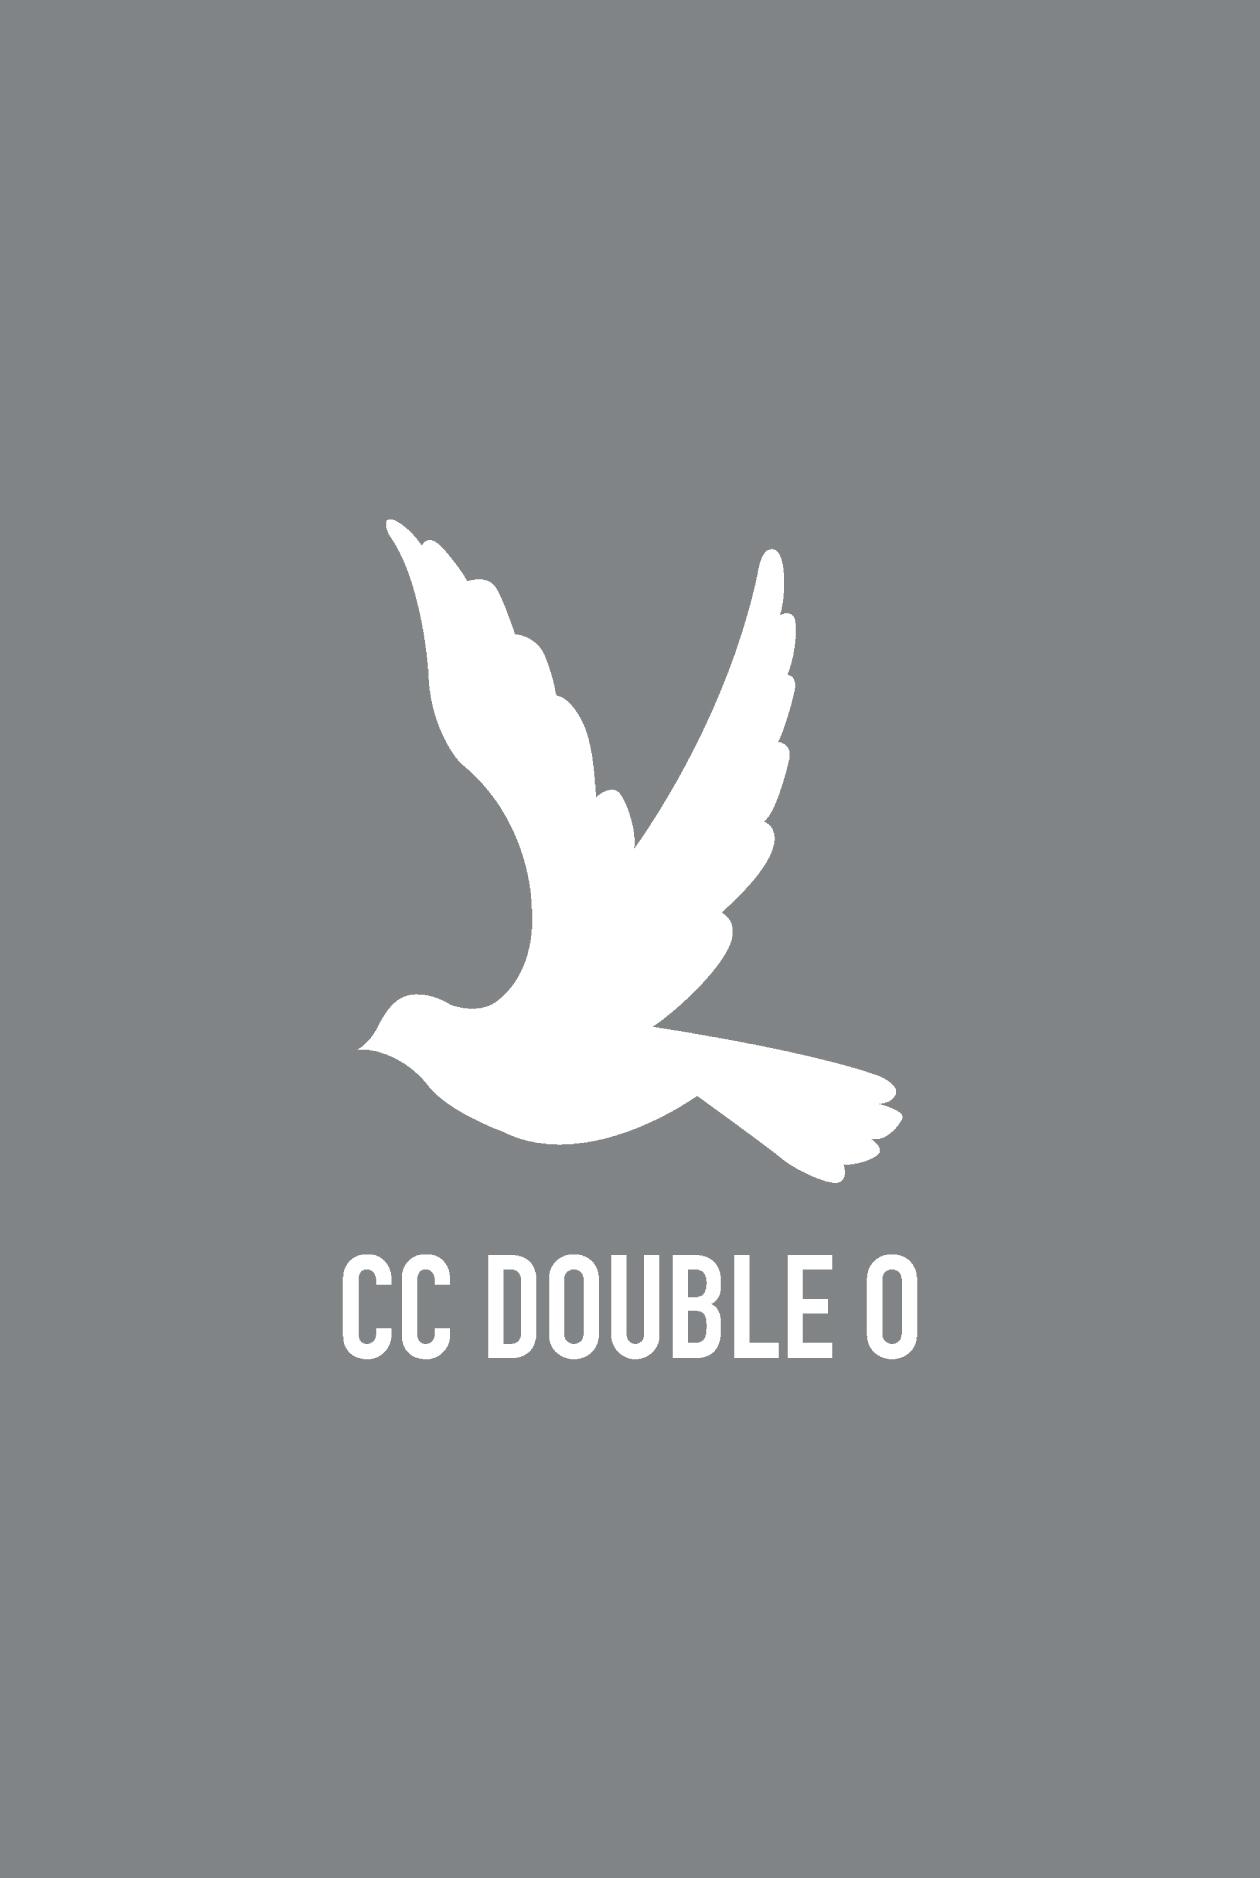 CROSS STITCH BIRD LOGO LONG-SLEEVED TEE